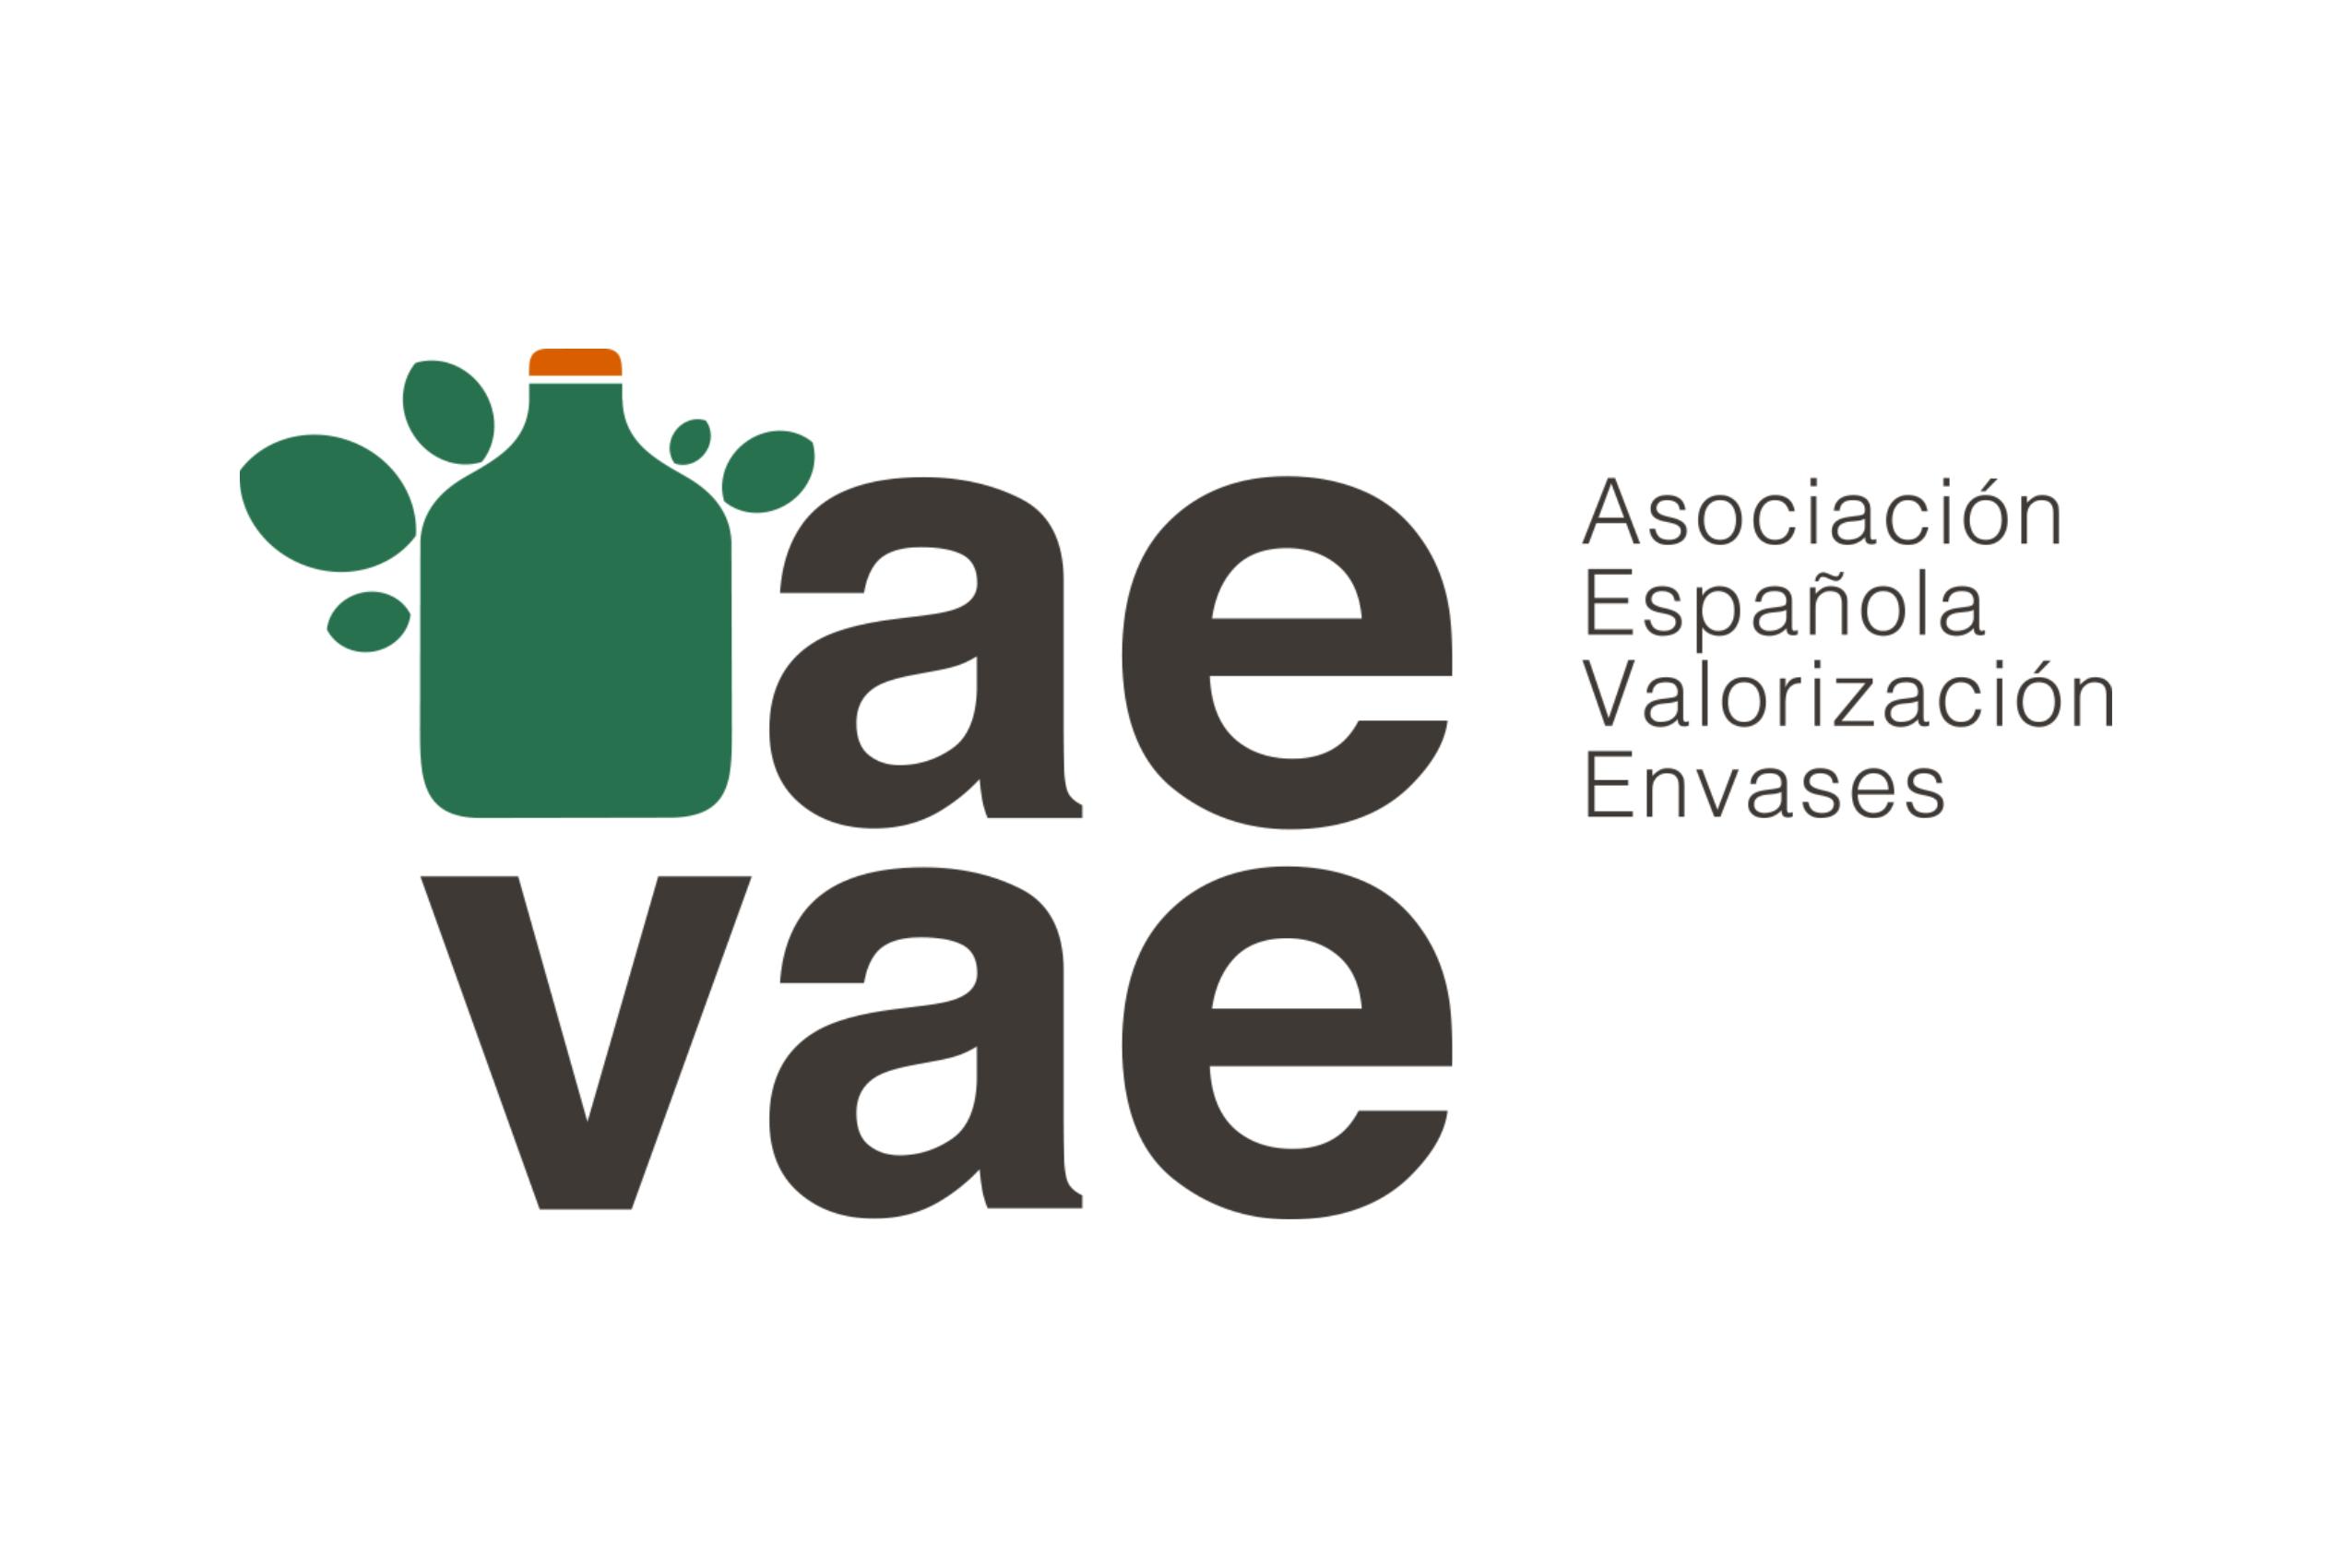 https://europeanplasticspact.org/wp-content/uploads/2021/05/aevae.png